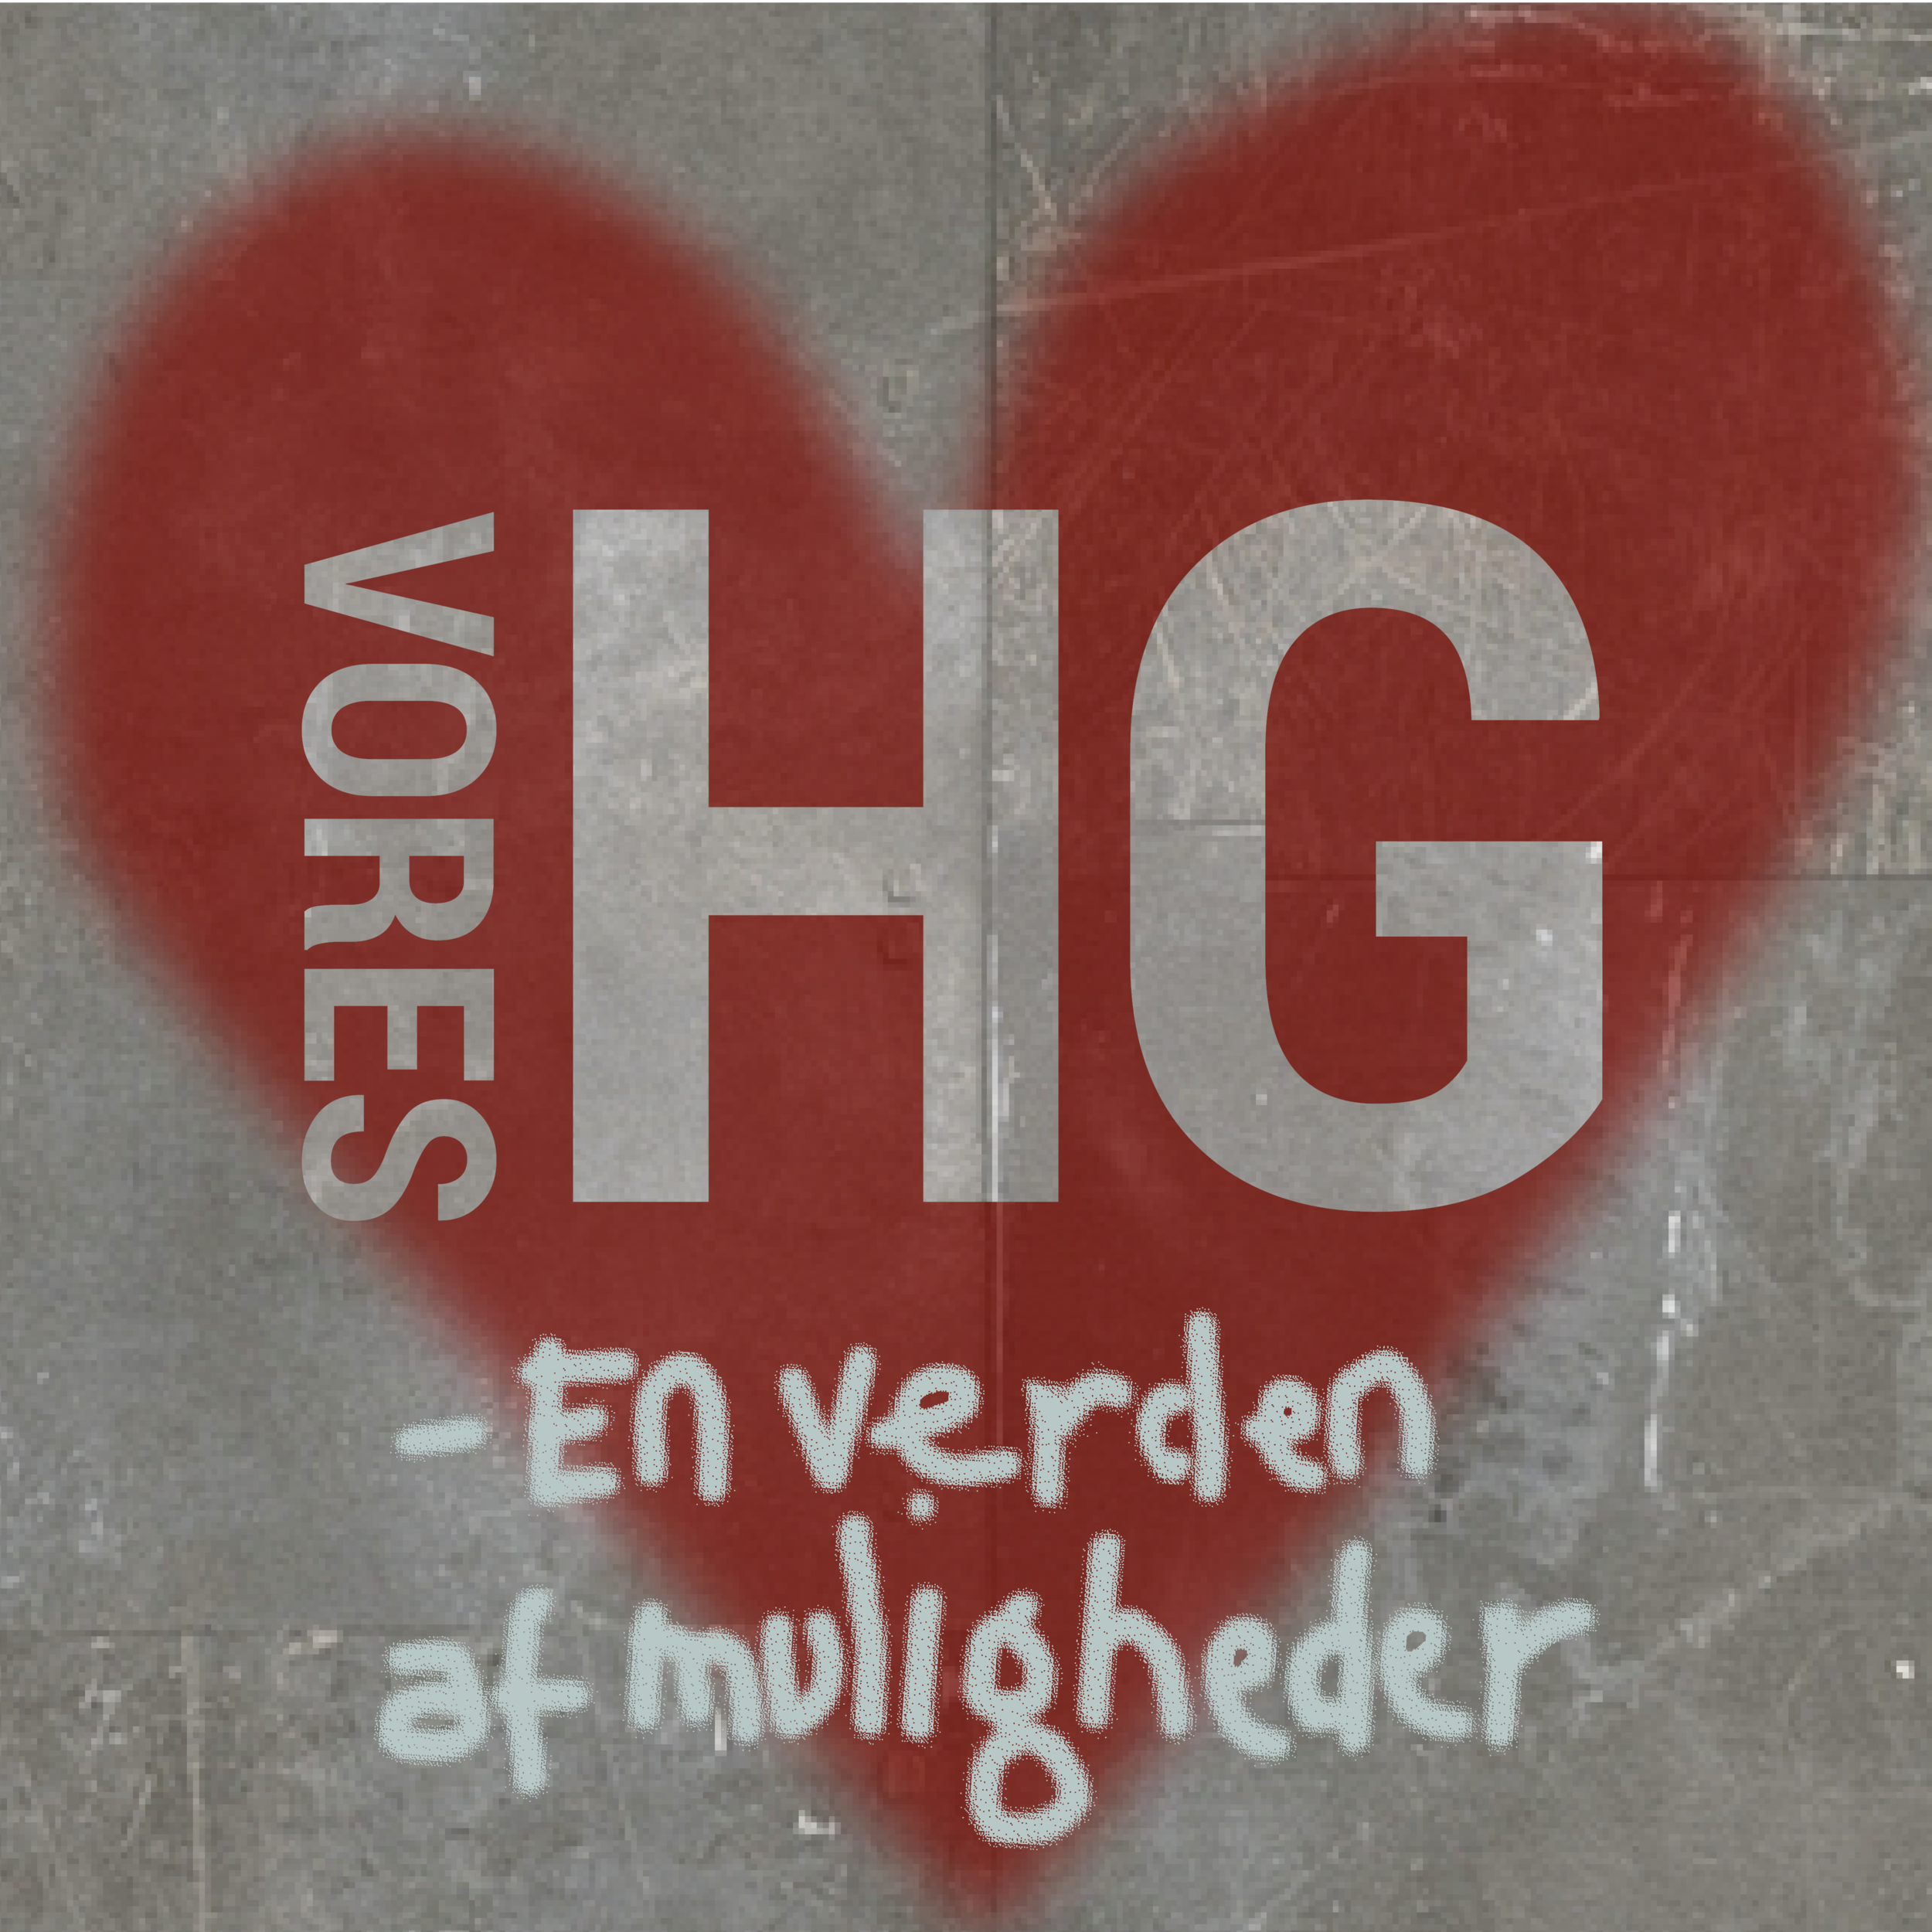 HG-logopng.png